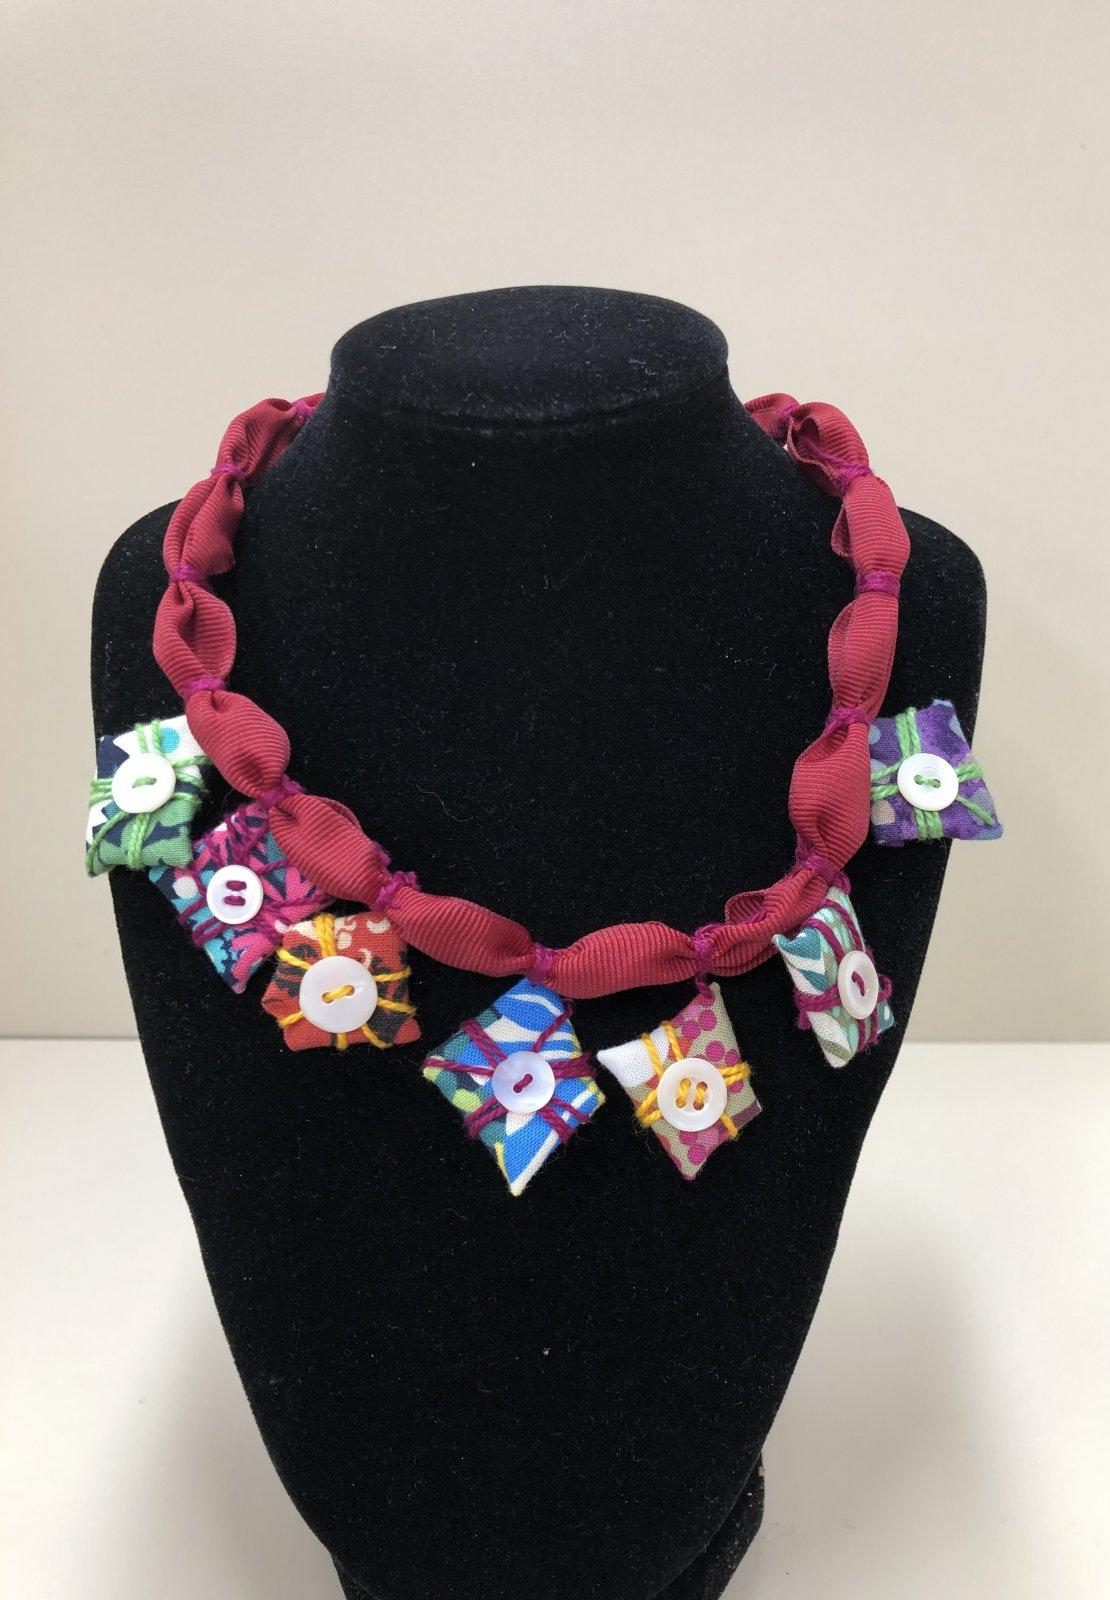 JEWEL- Presents Necklace